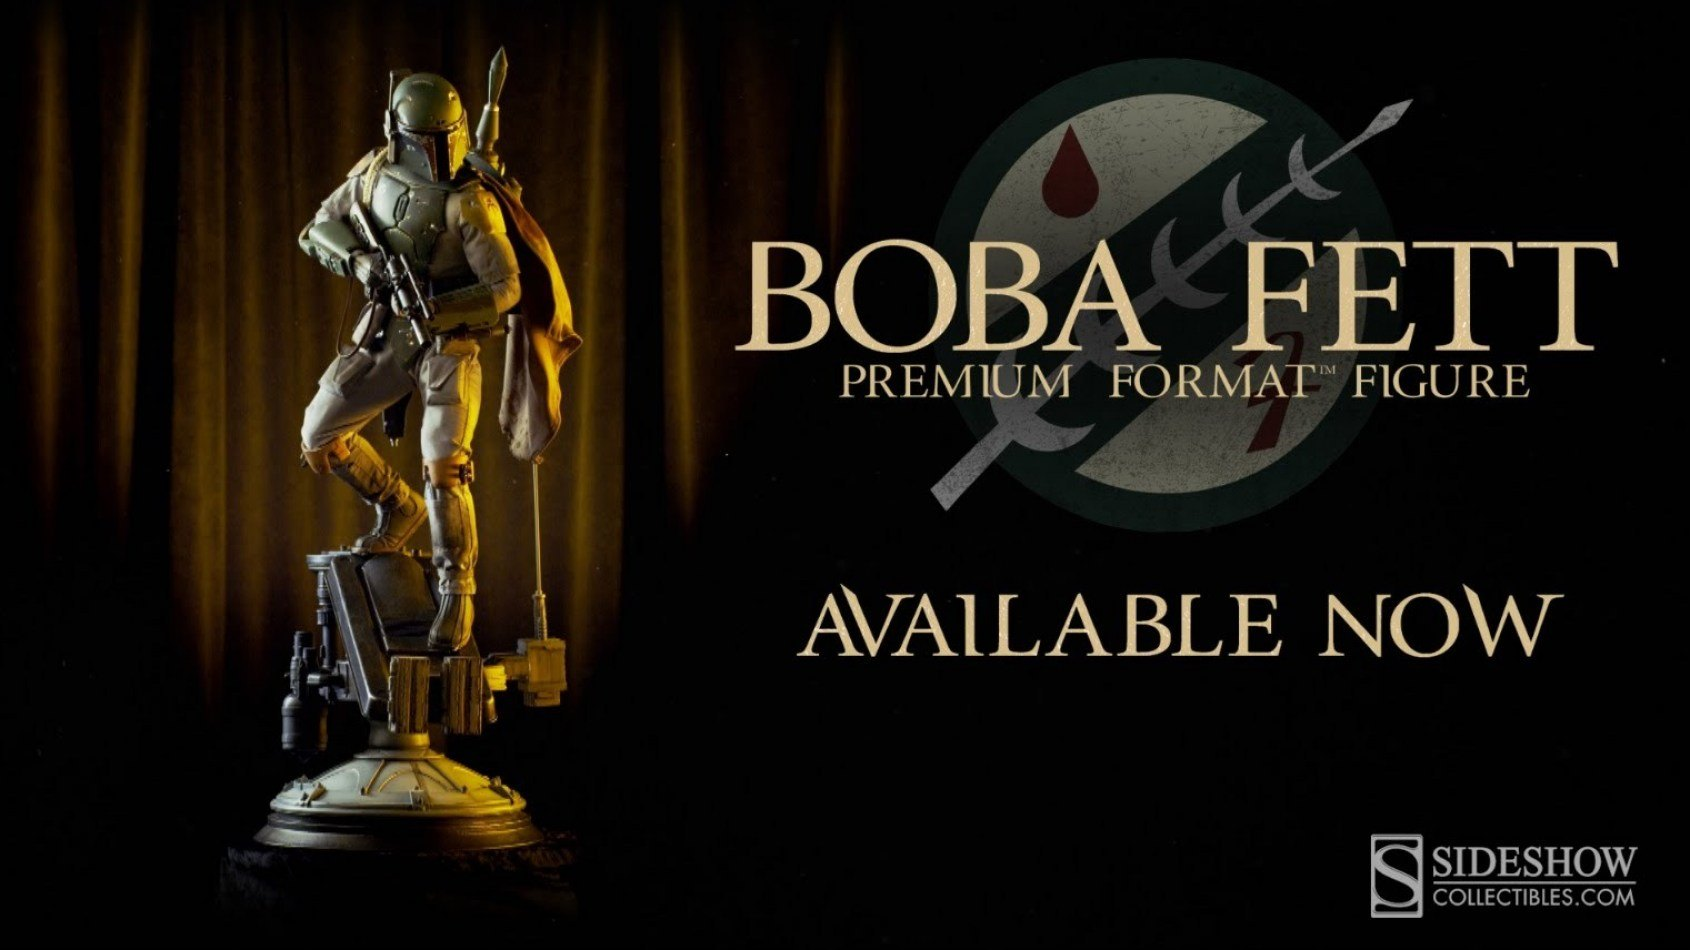 [Sideshow Collectibles] Boba Fett Premium Format™